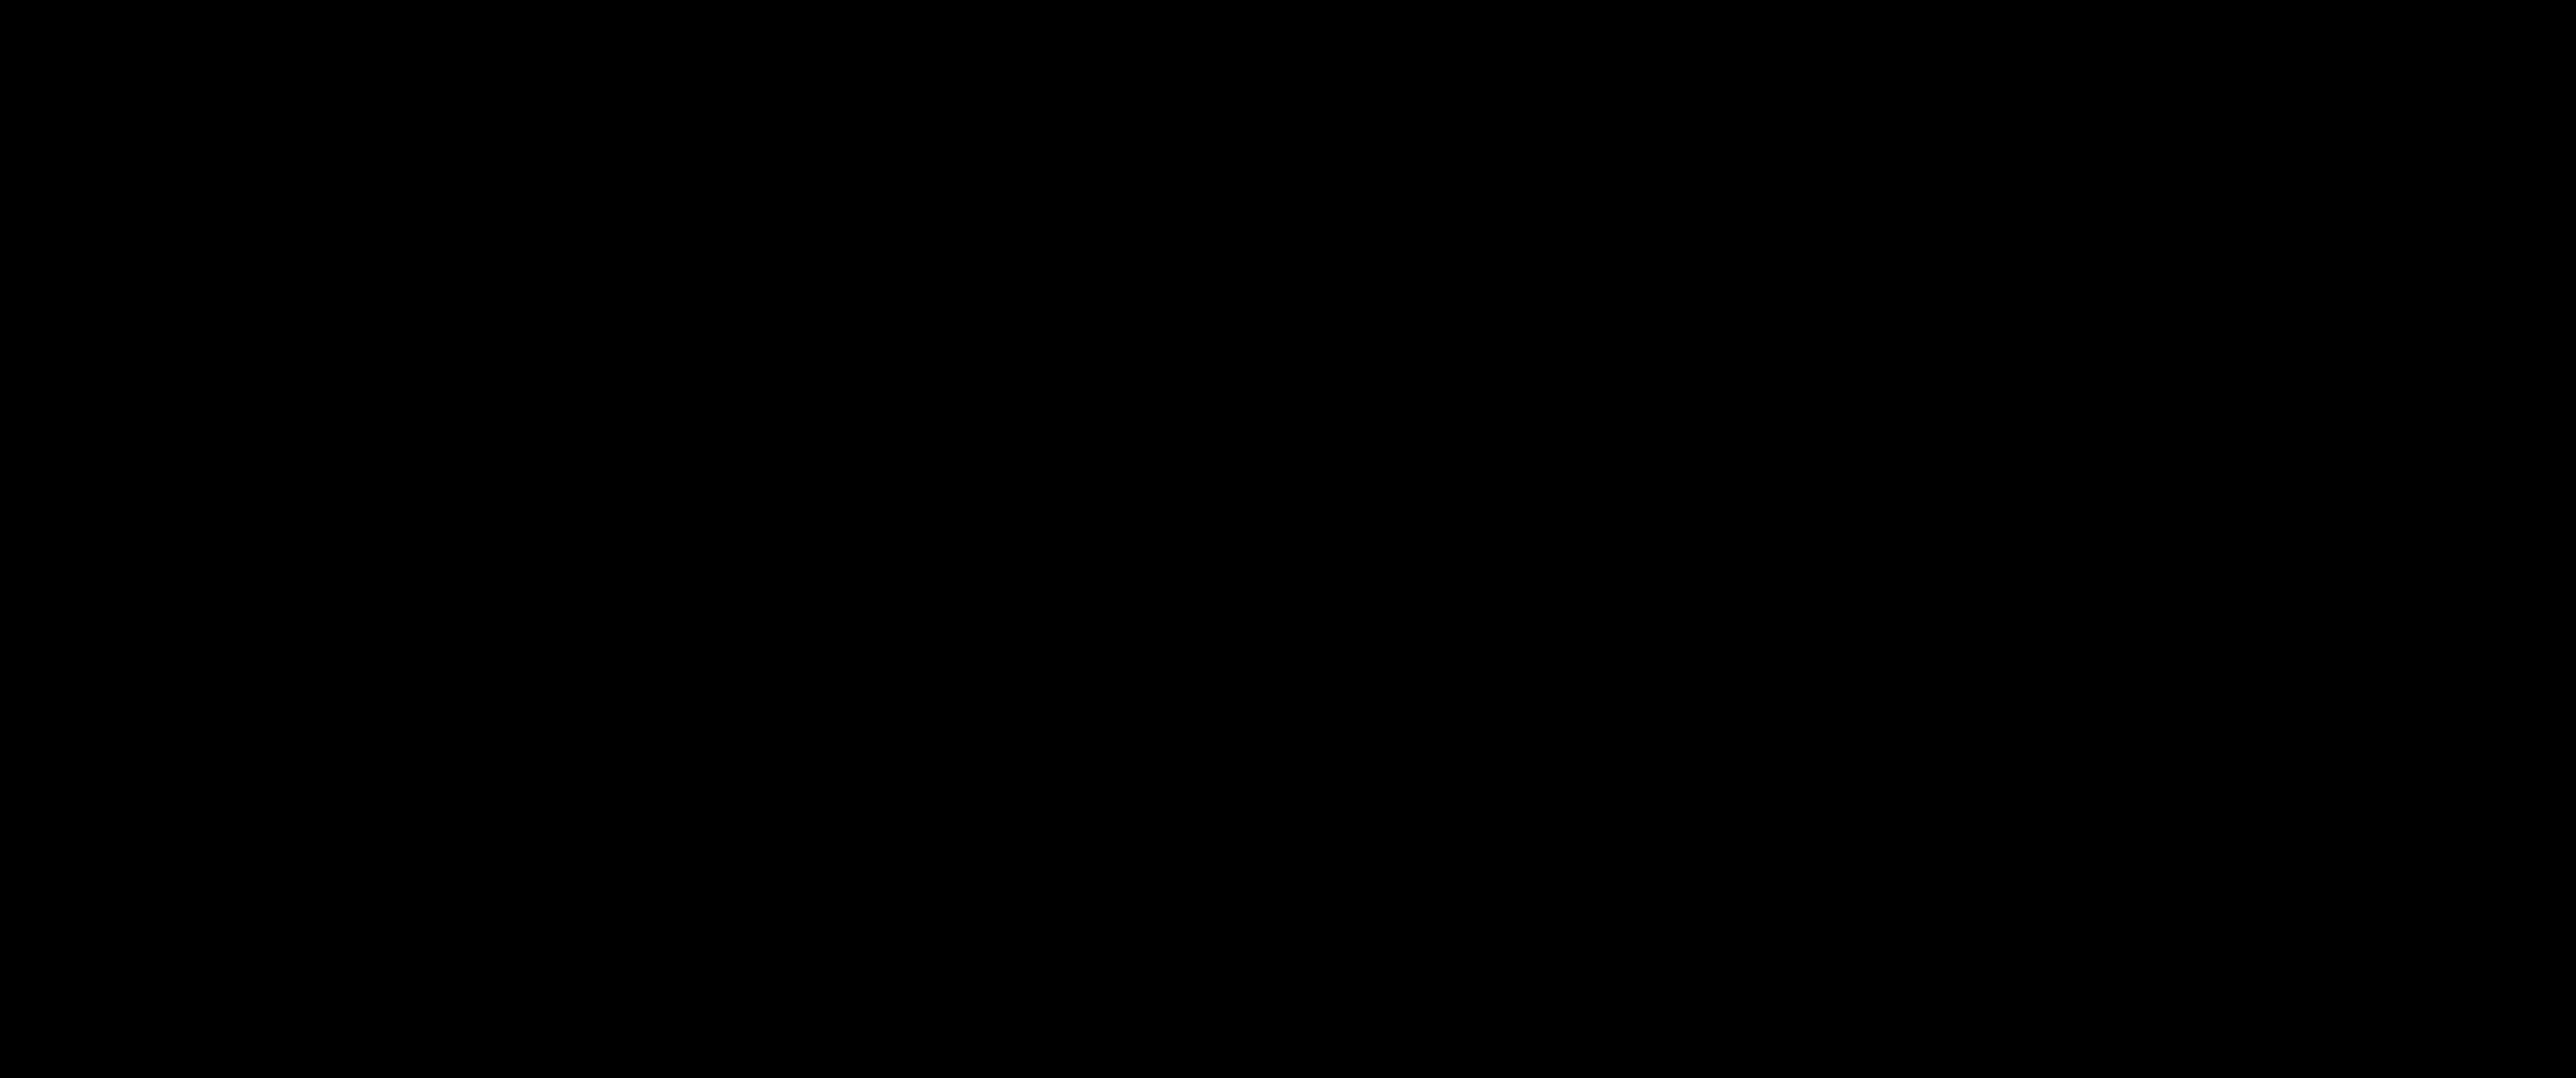 MINIM Logo